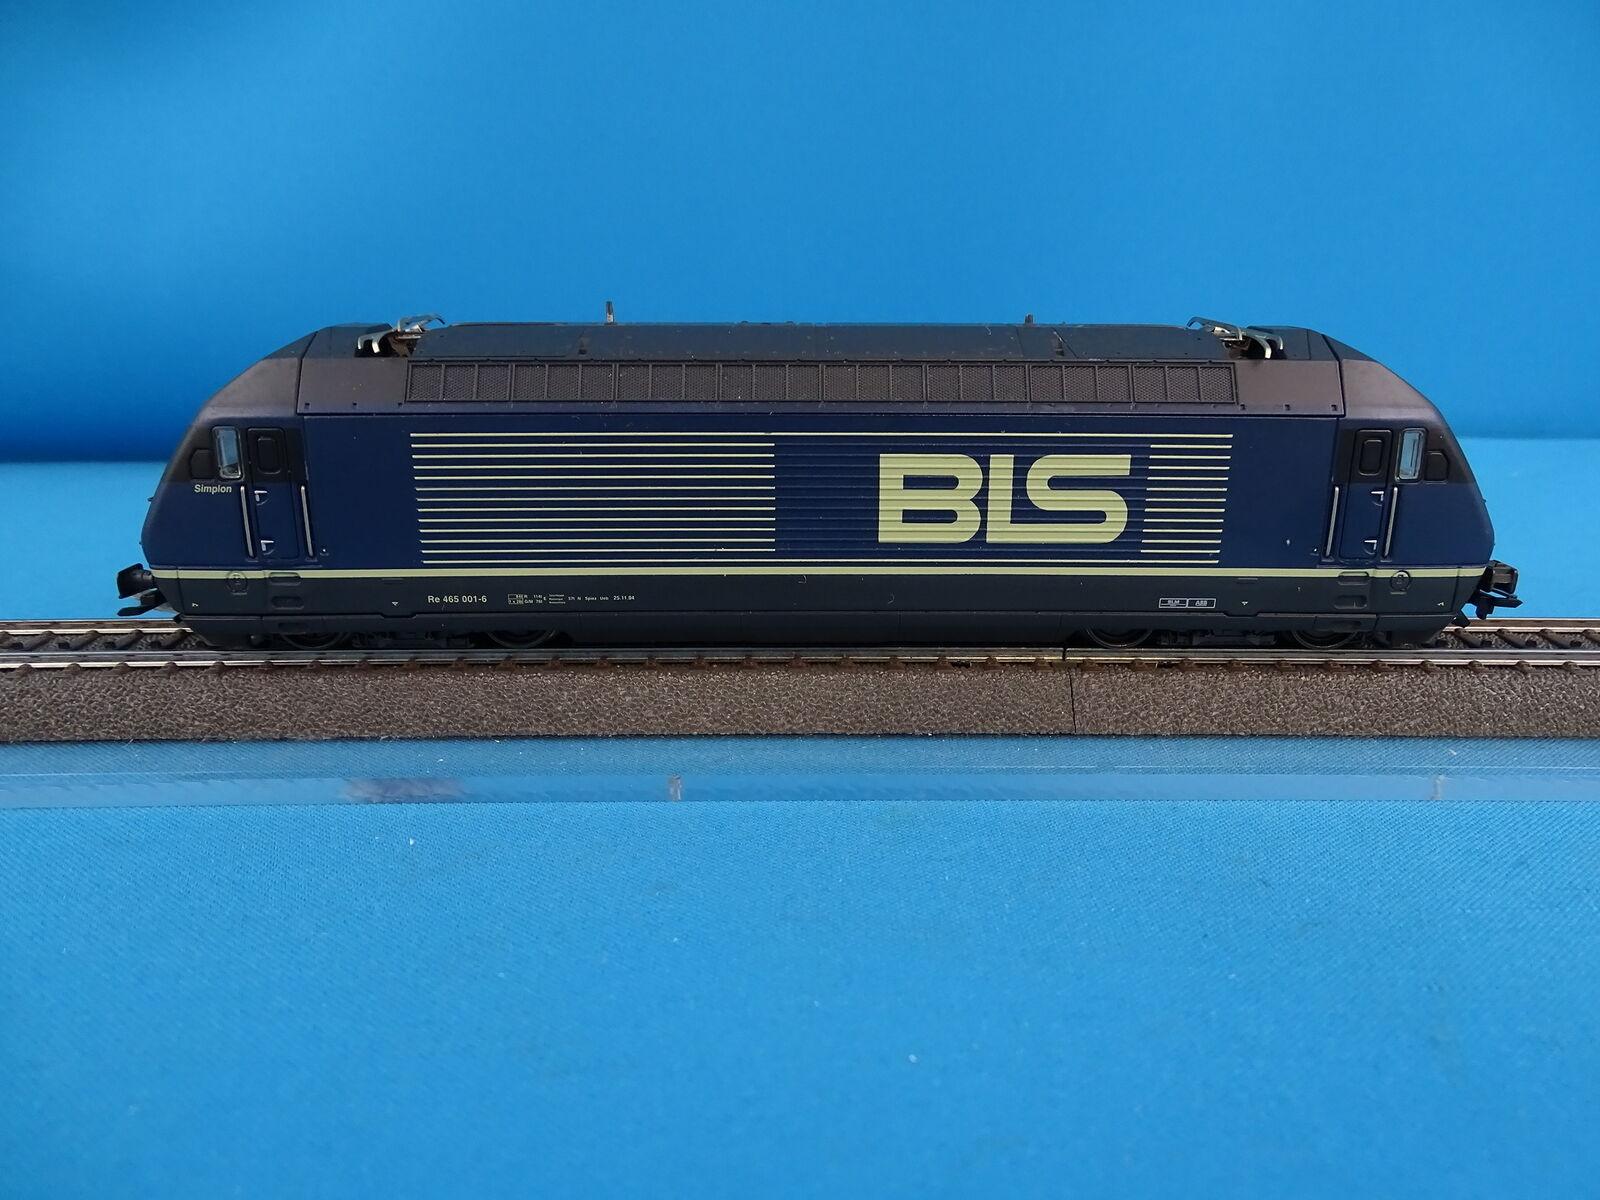 Marklin 3763 BLS Electric Locomotive Br 465 blueE DIGITAL